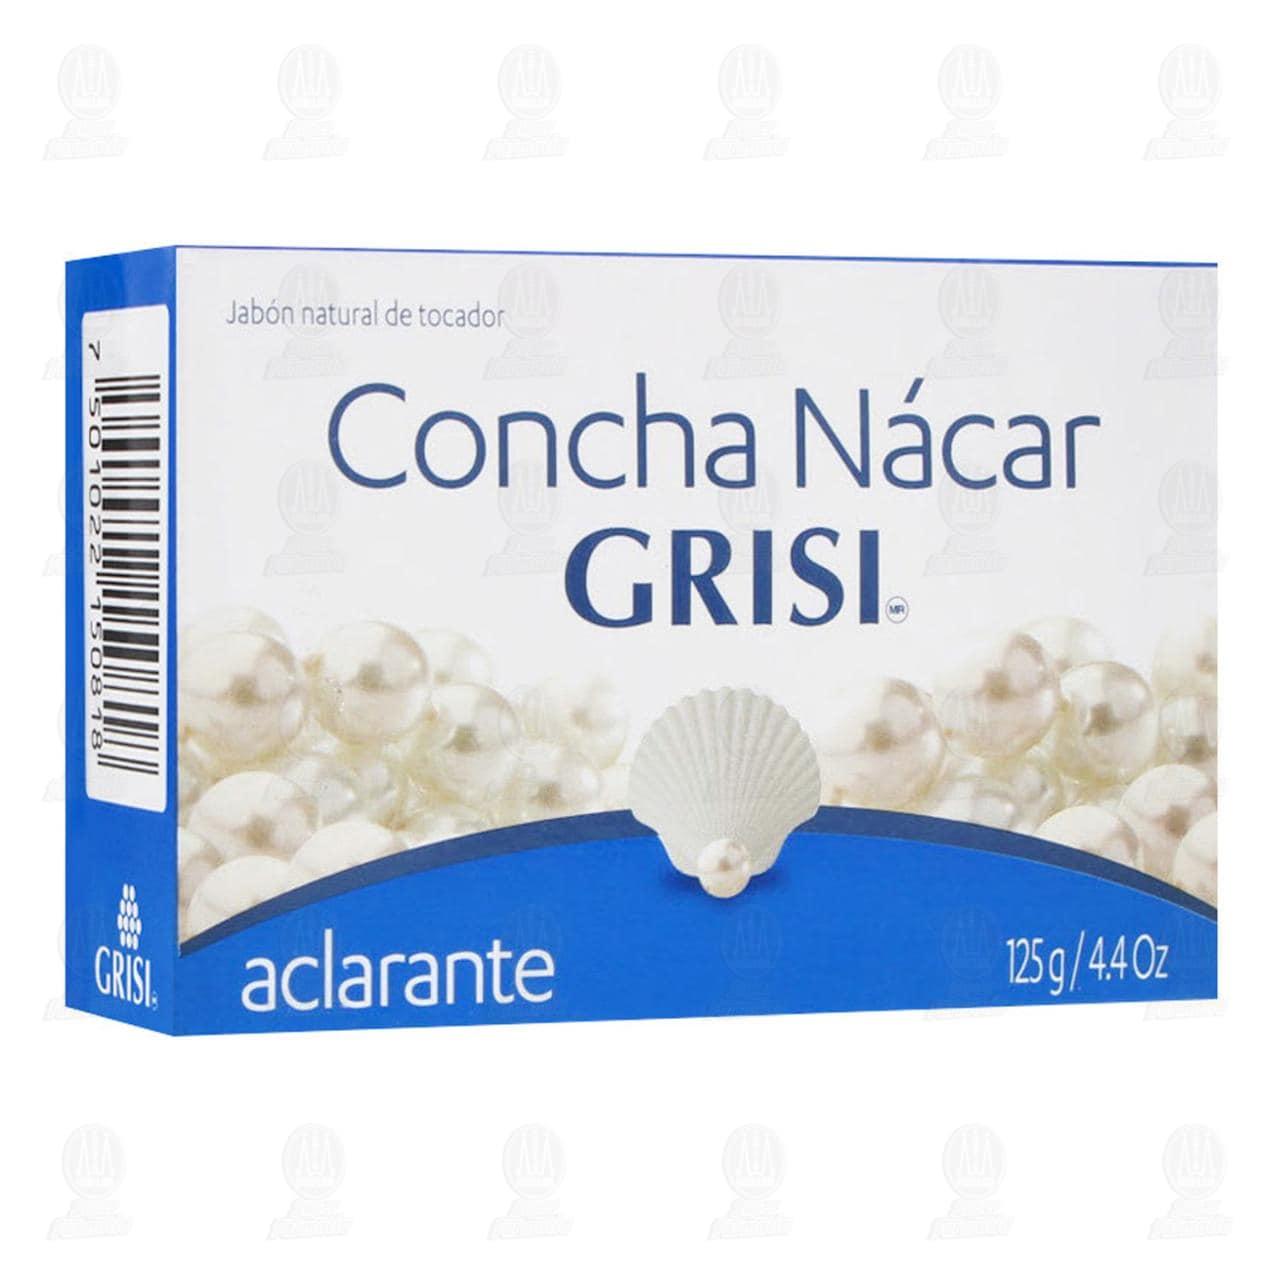 Comprar Jabón Concha Nácar Grisi, 125 gr. en Farmacias Guadalajara